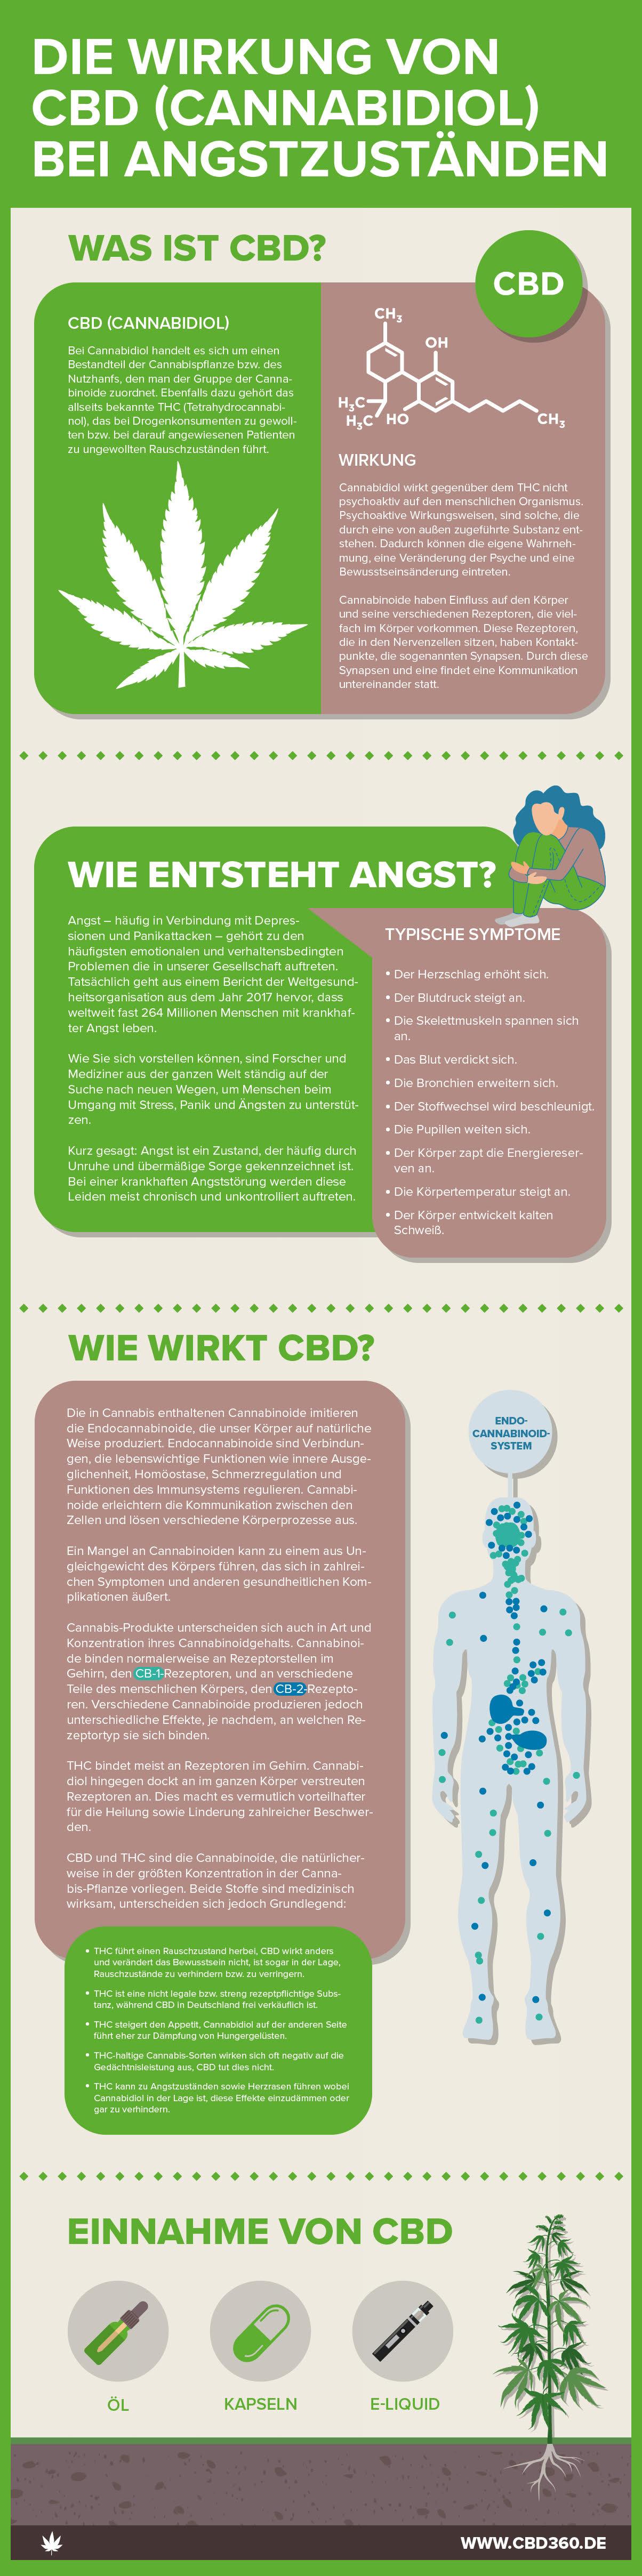 infografik-cbd-angststoerung